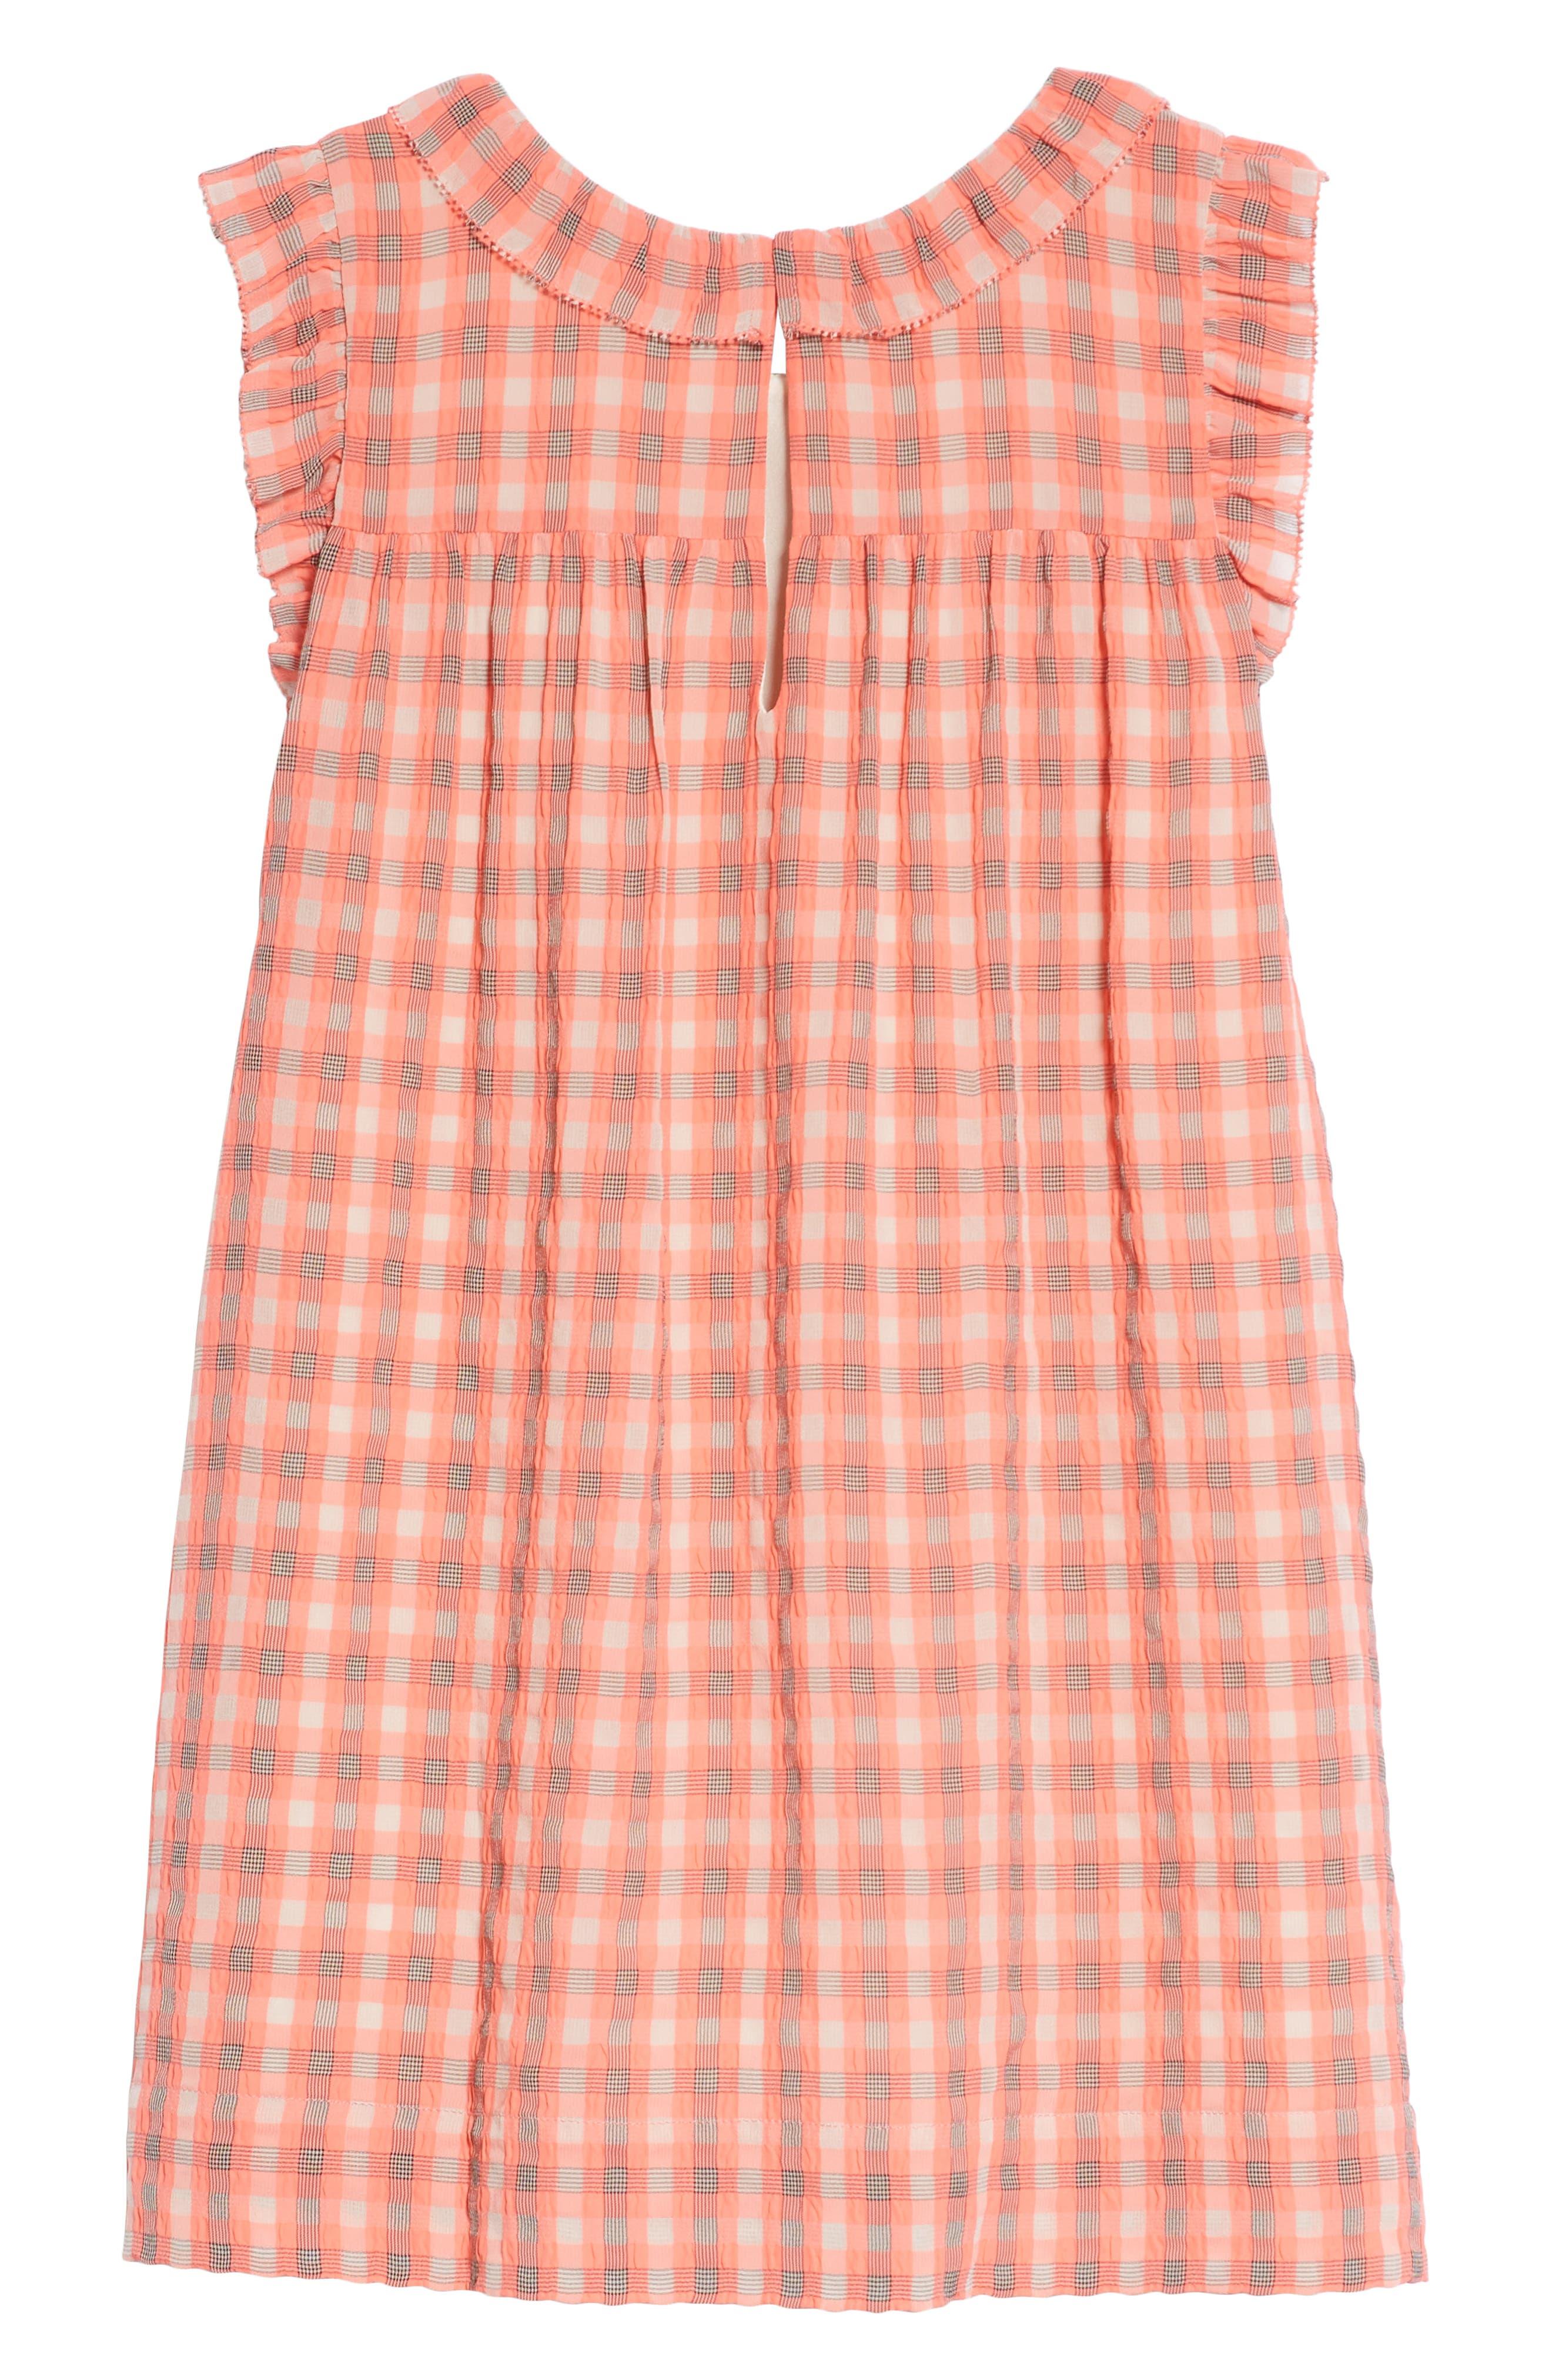 Magnoly Check Ruffle Dress,                             Alternate thumbnail 2, color,